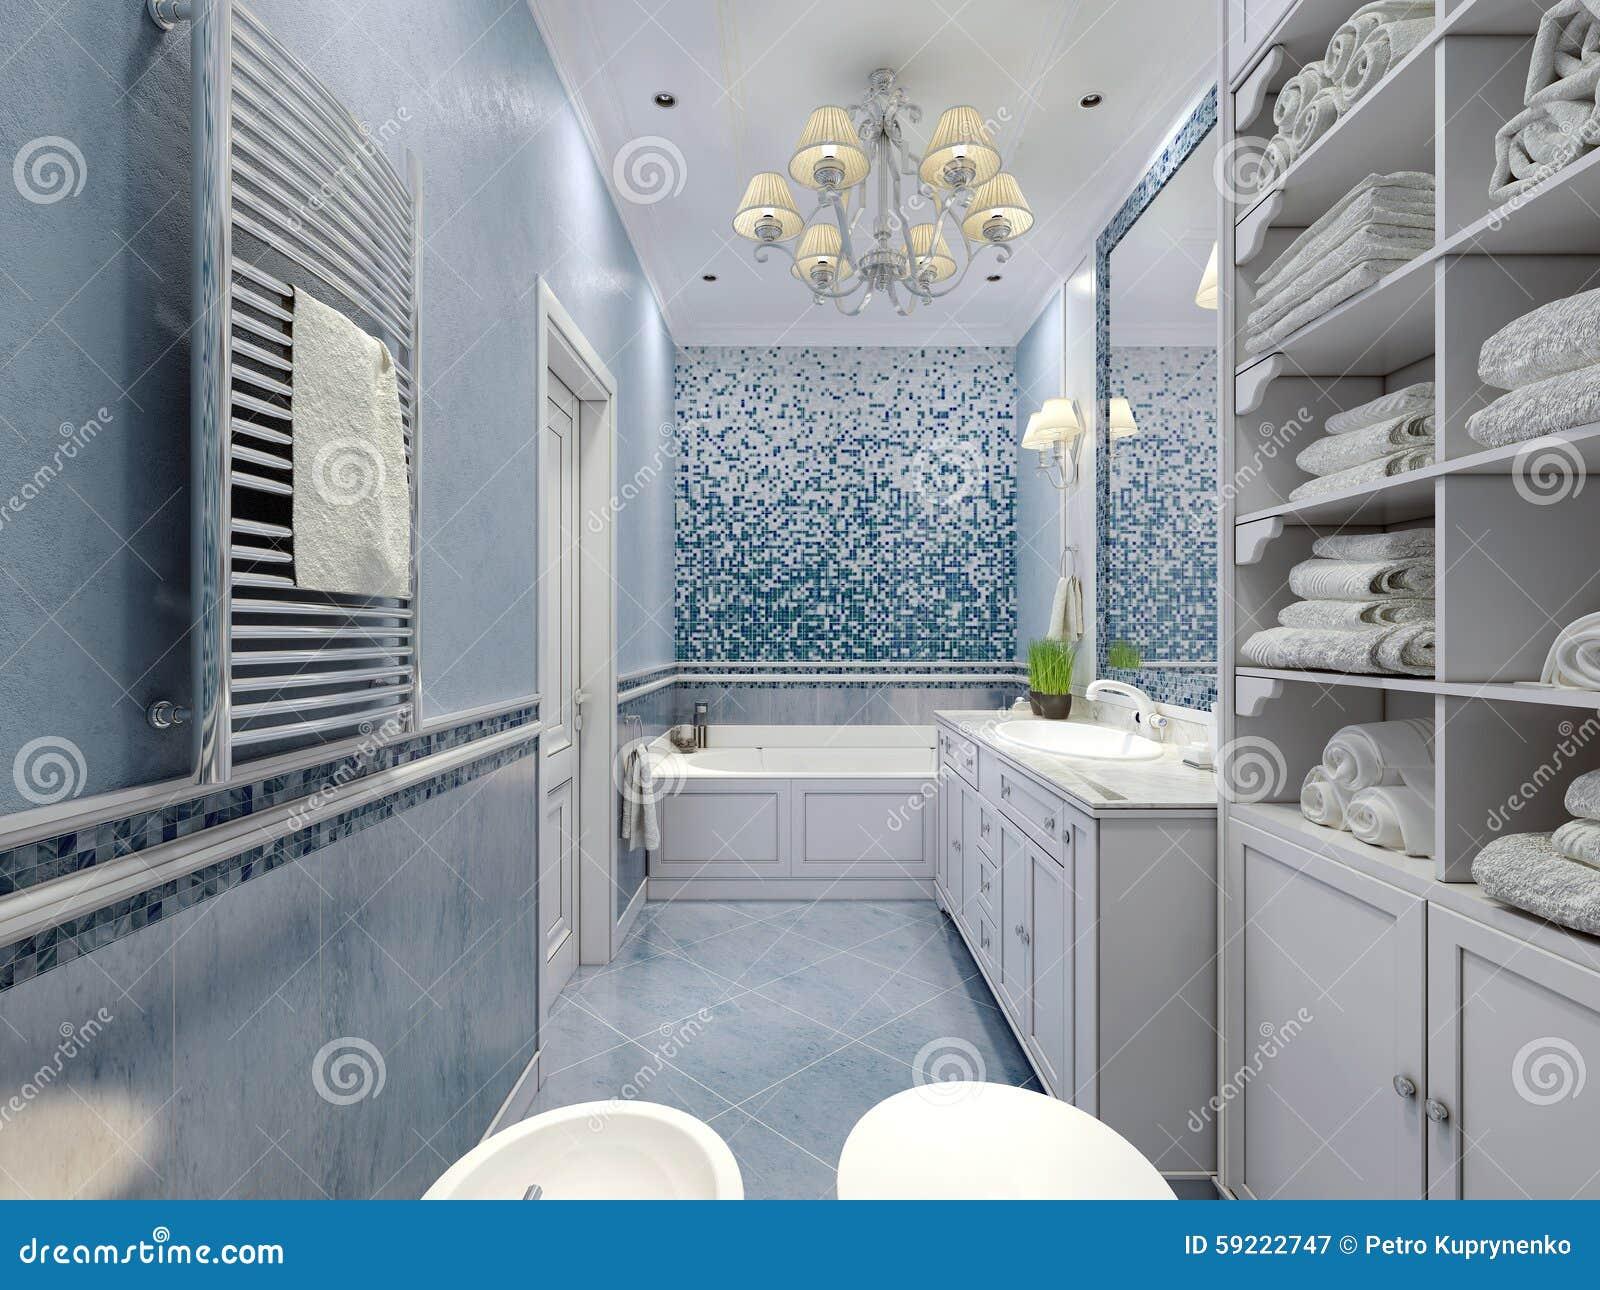 Ruime blauwe badkamers klassieke stijl stock afbeelding